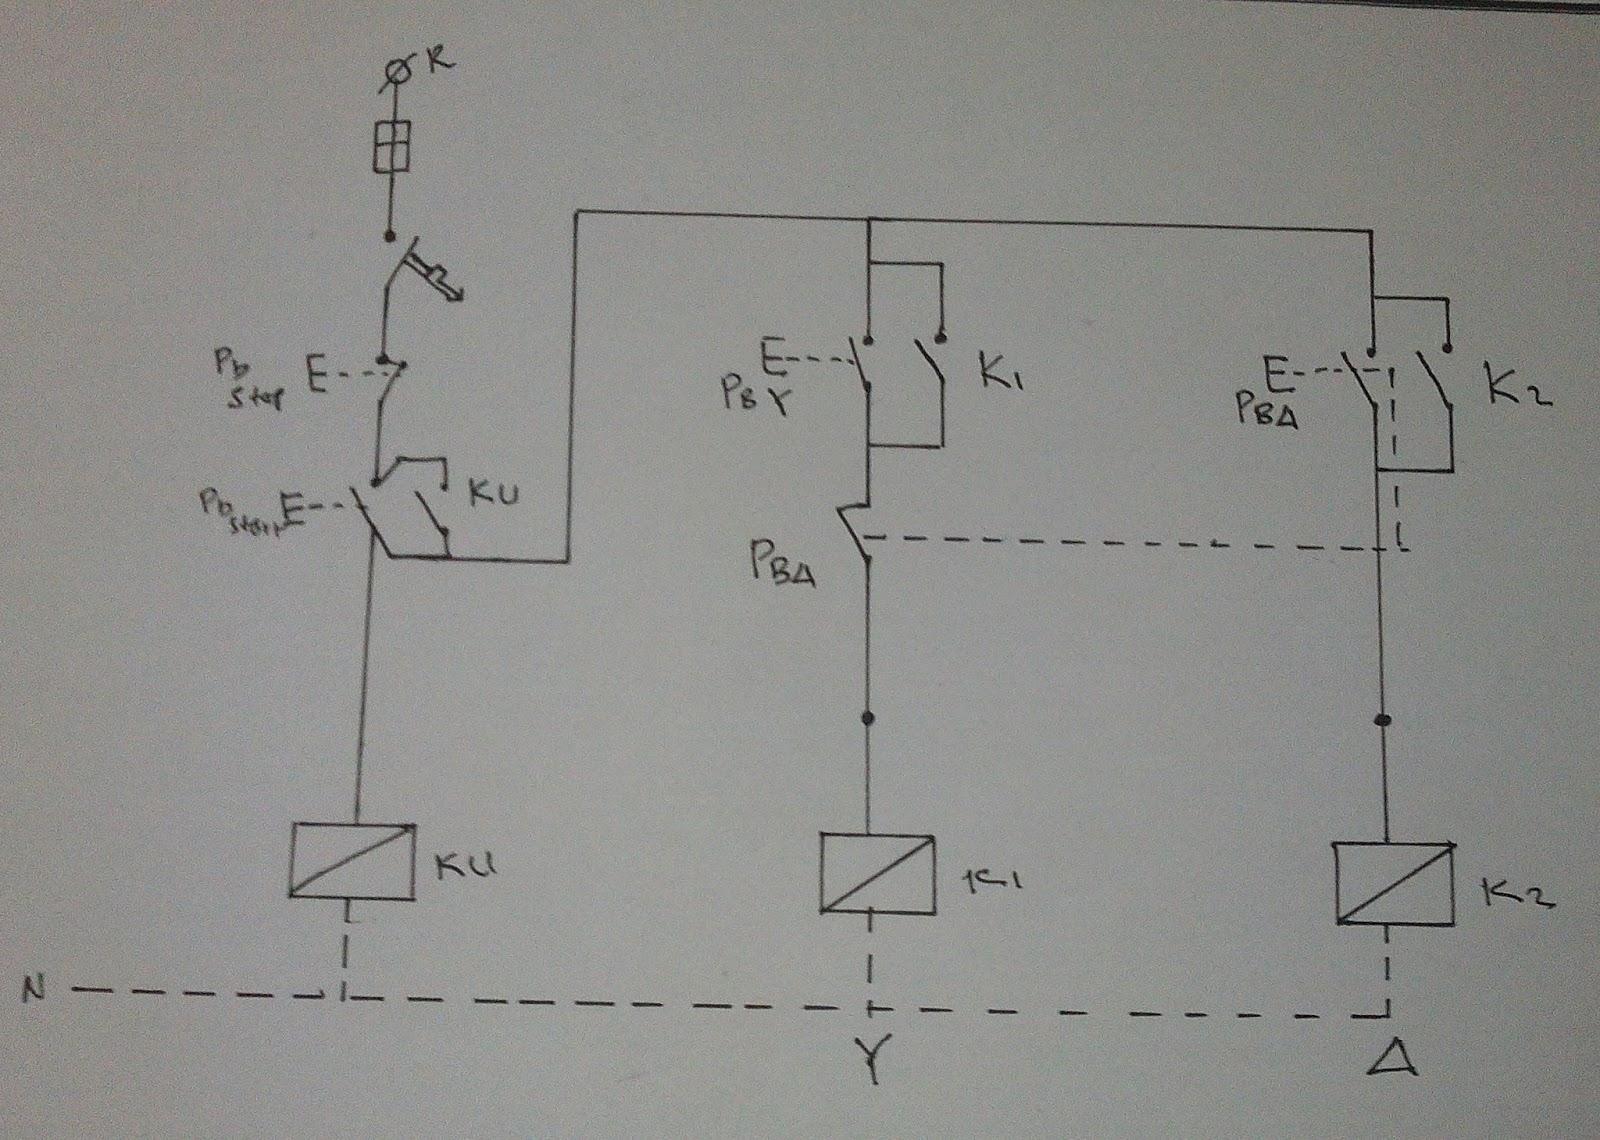 eaton auto shift wiring diagram auto air conditioning